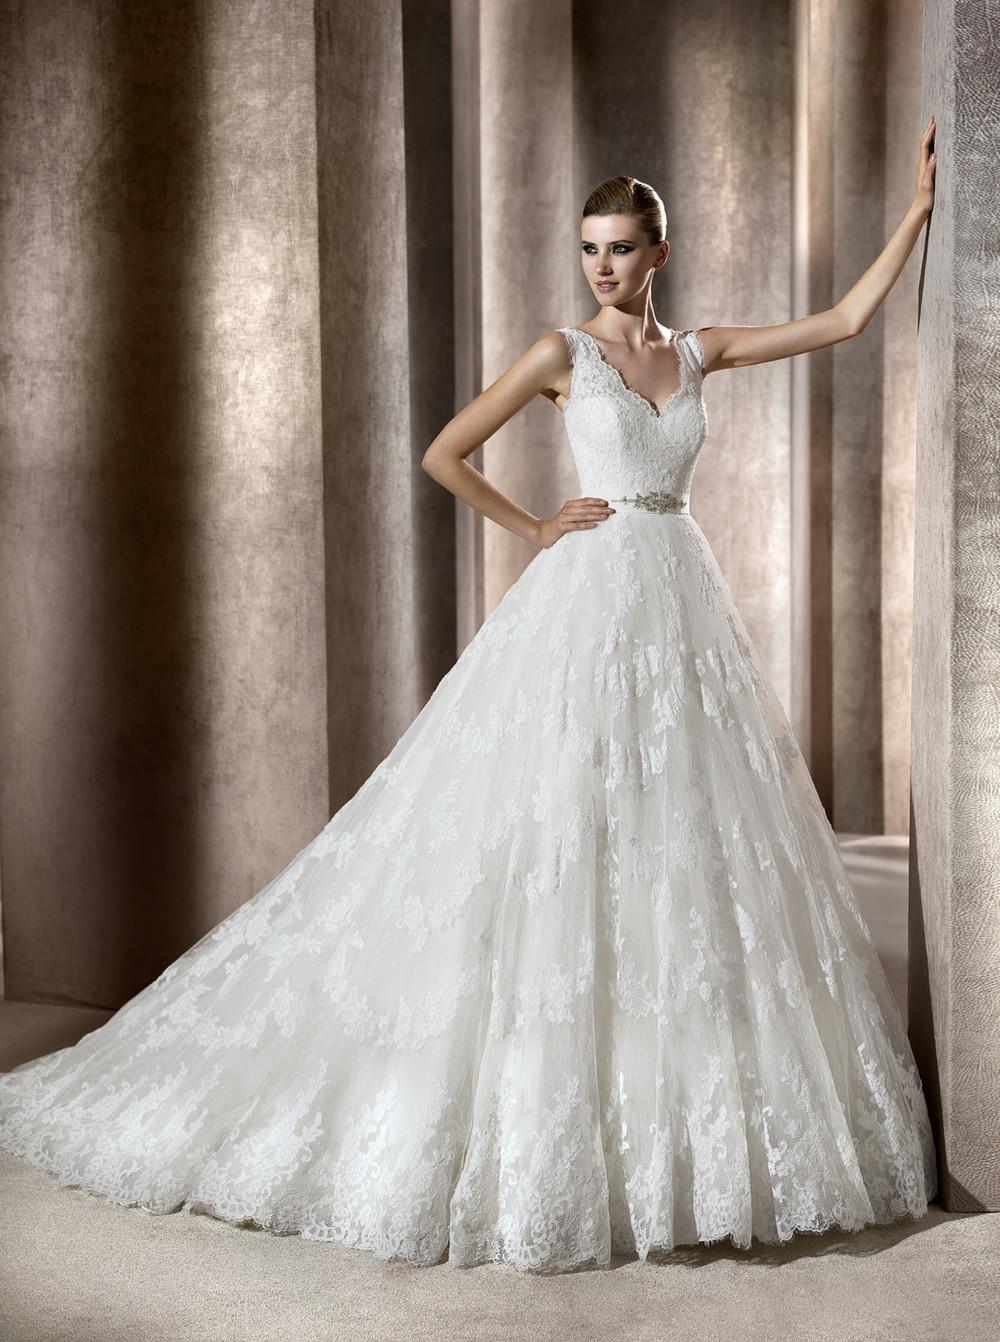 Elie Saab Caelum Size 2 elie saab wedding dress Sorry this Elie Saab Caelum has sold or is no longer available